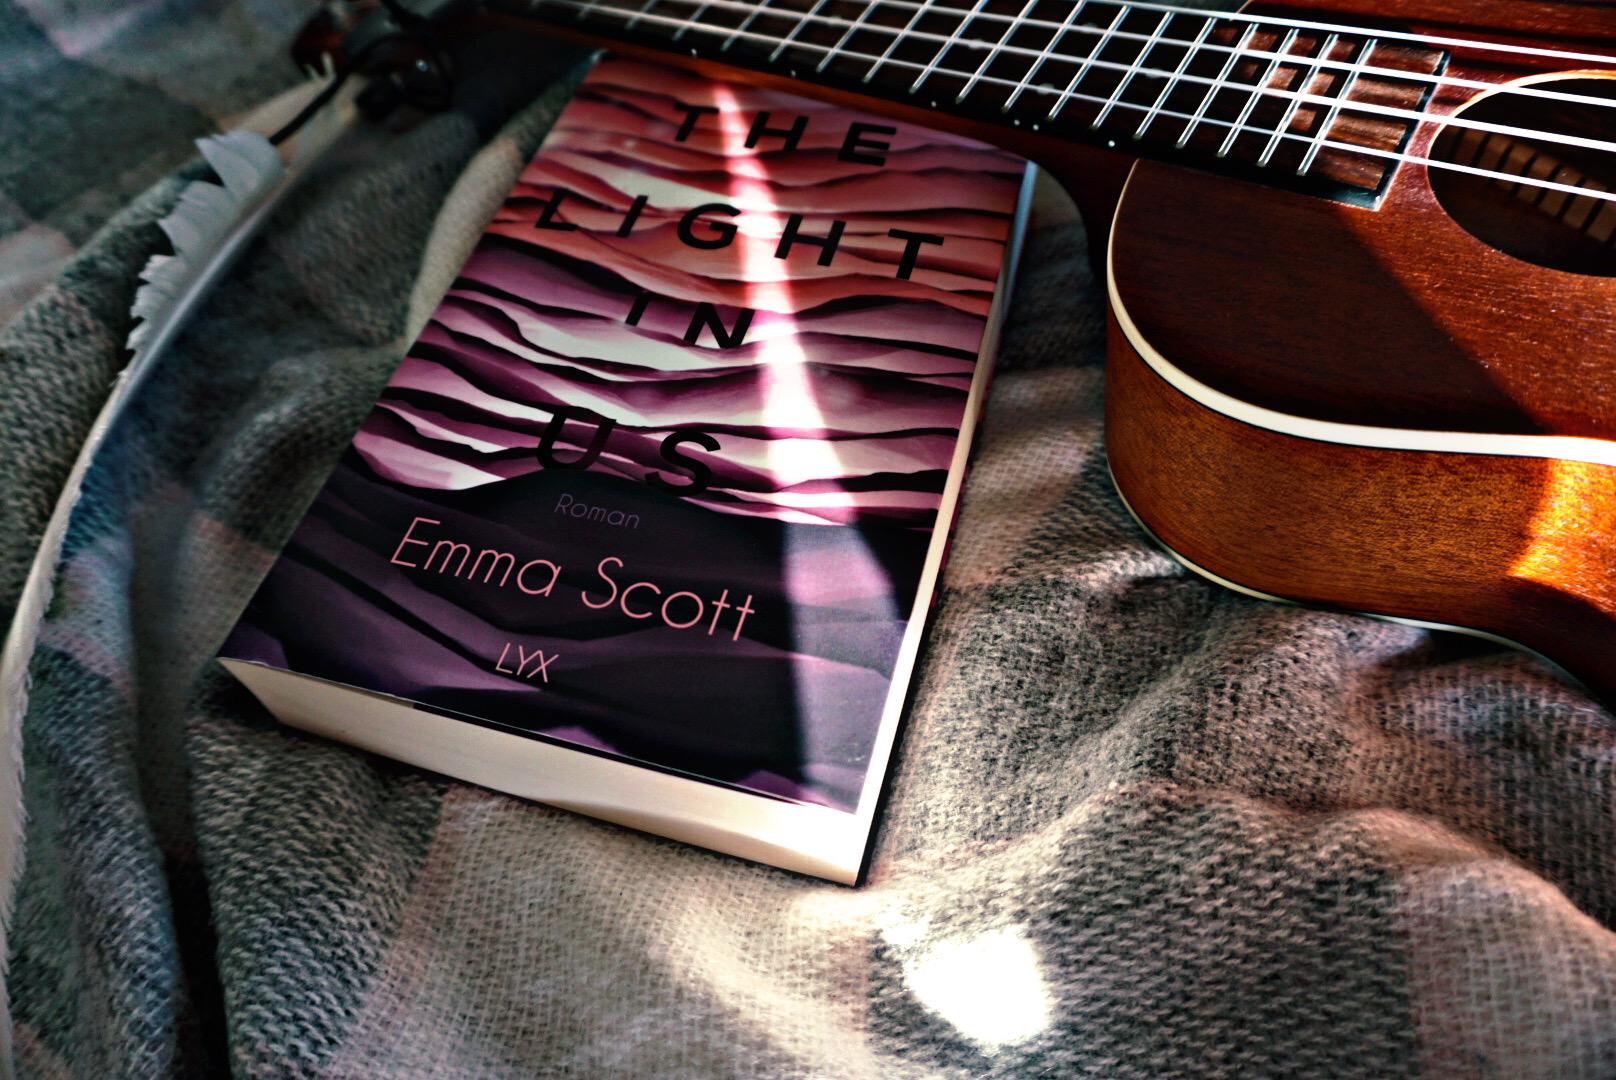 The Light in us – Emma Scott